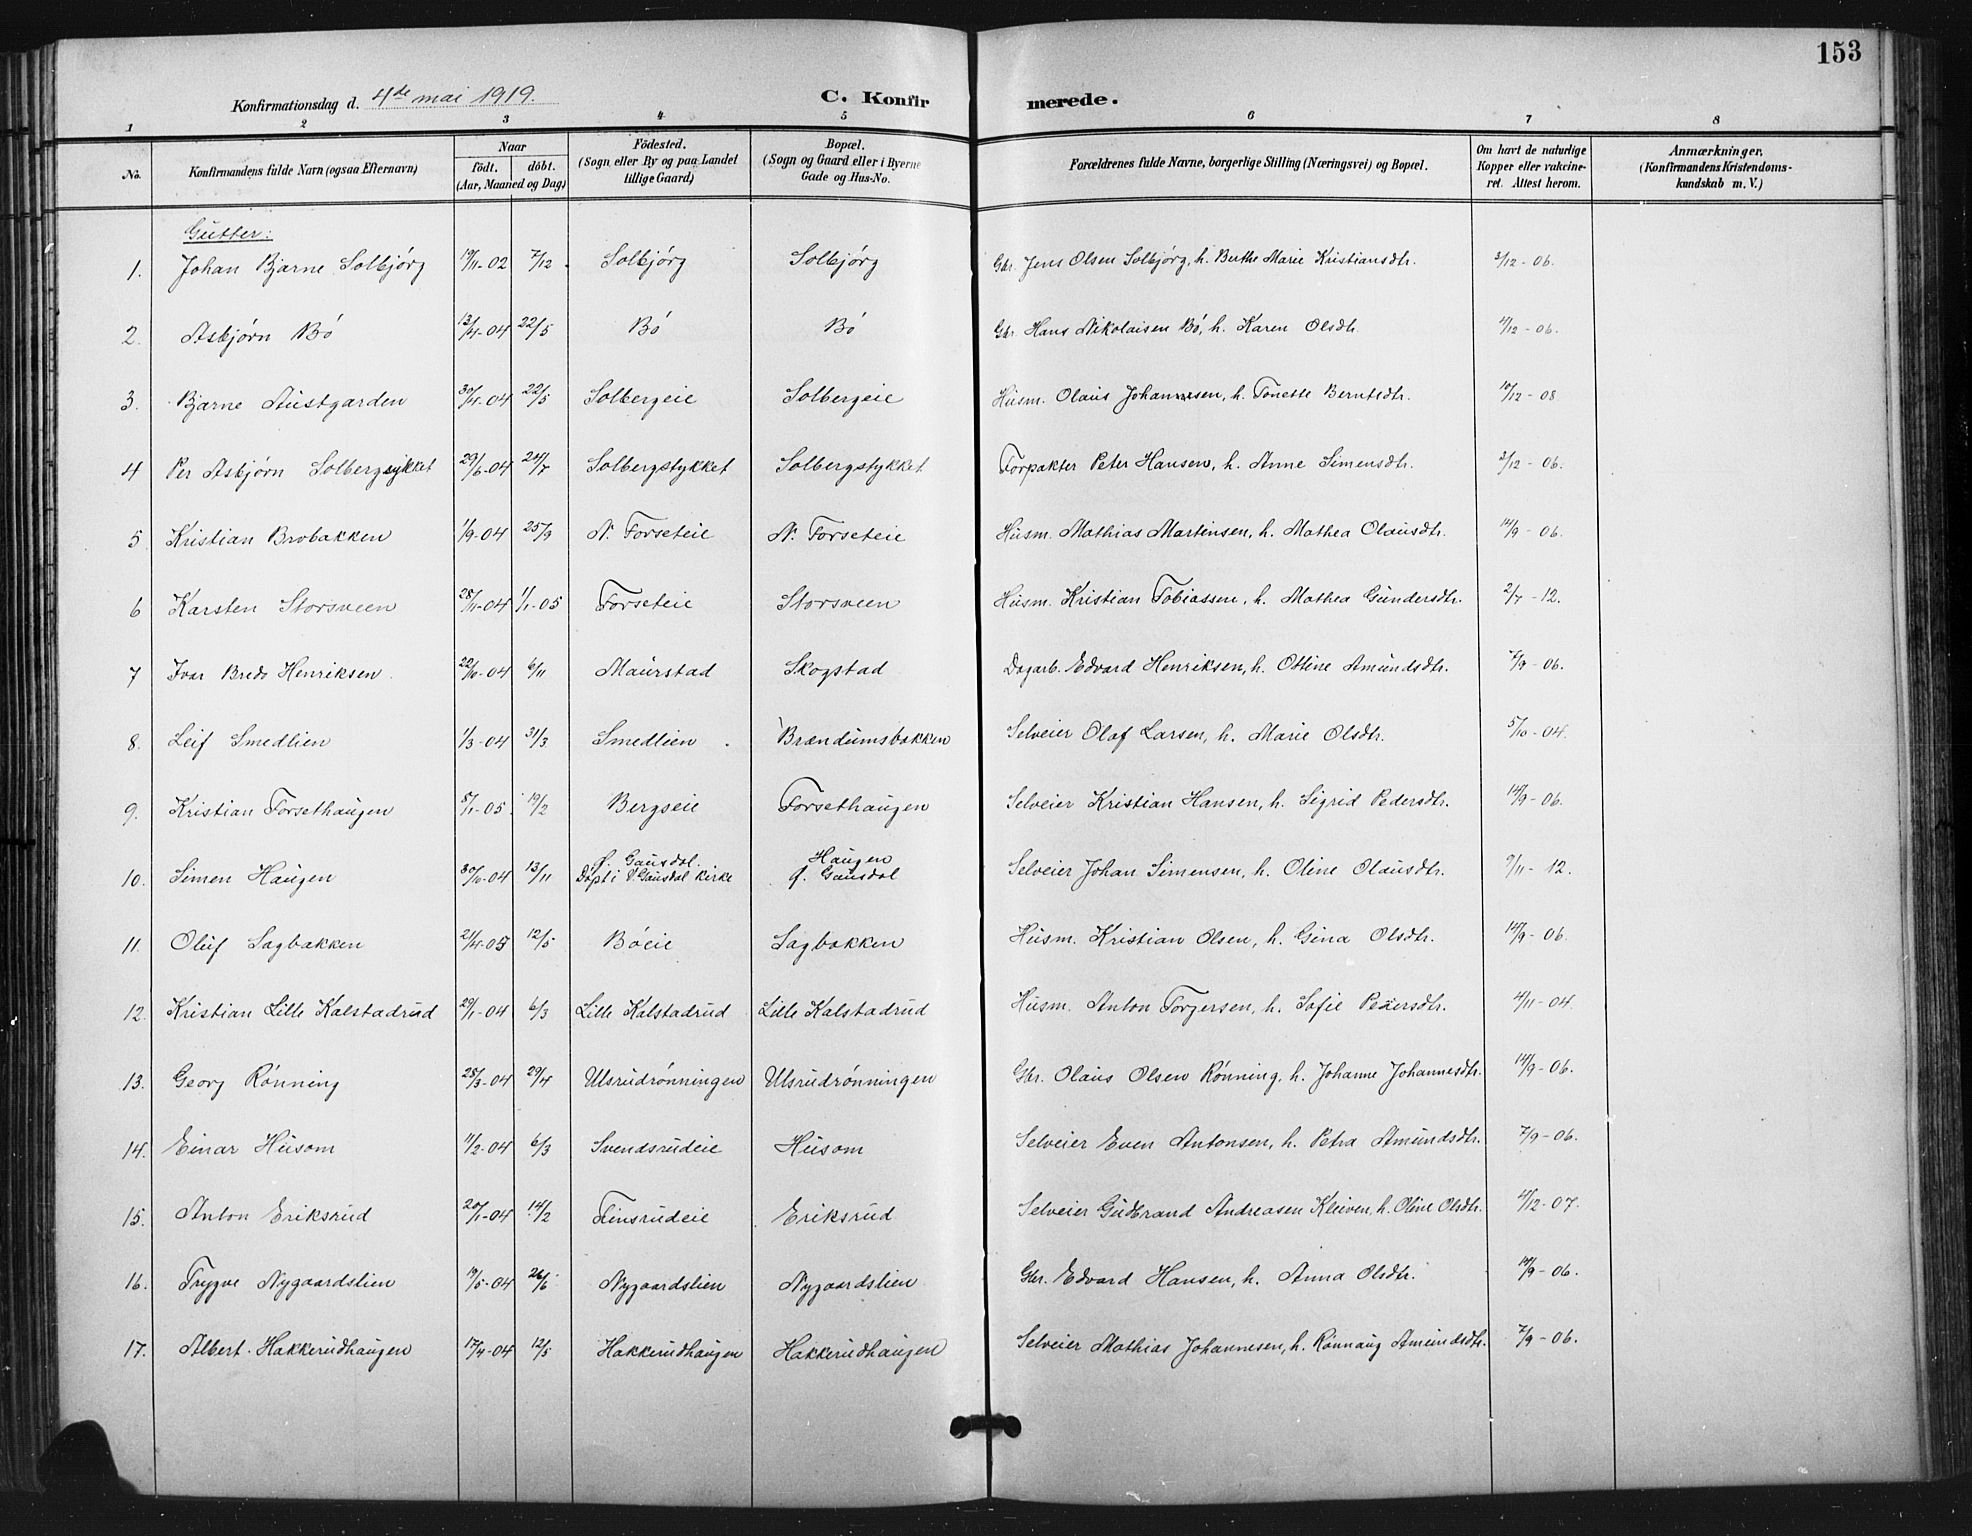 SAH, Vestre Gausdal prestekontor, Klokkerbok nr. 3, 1896-1925, s. 153